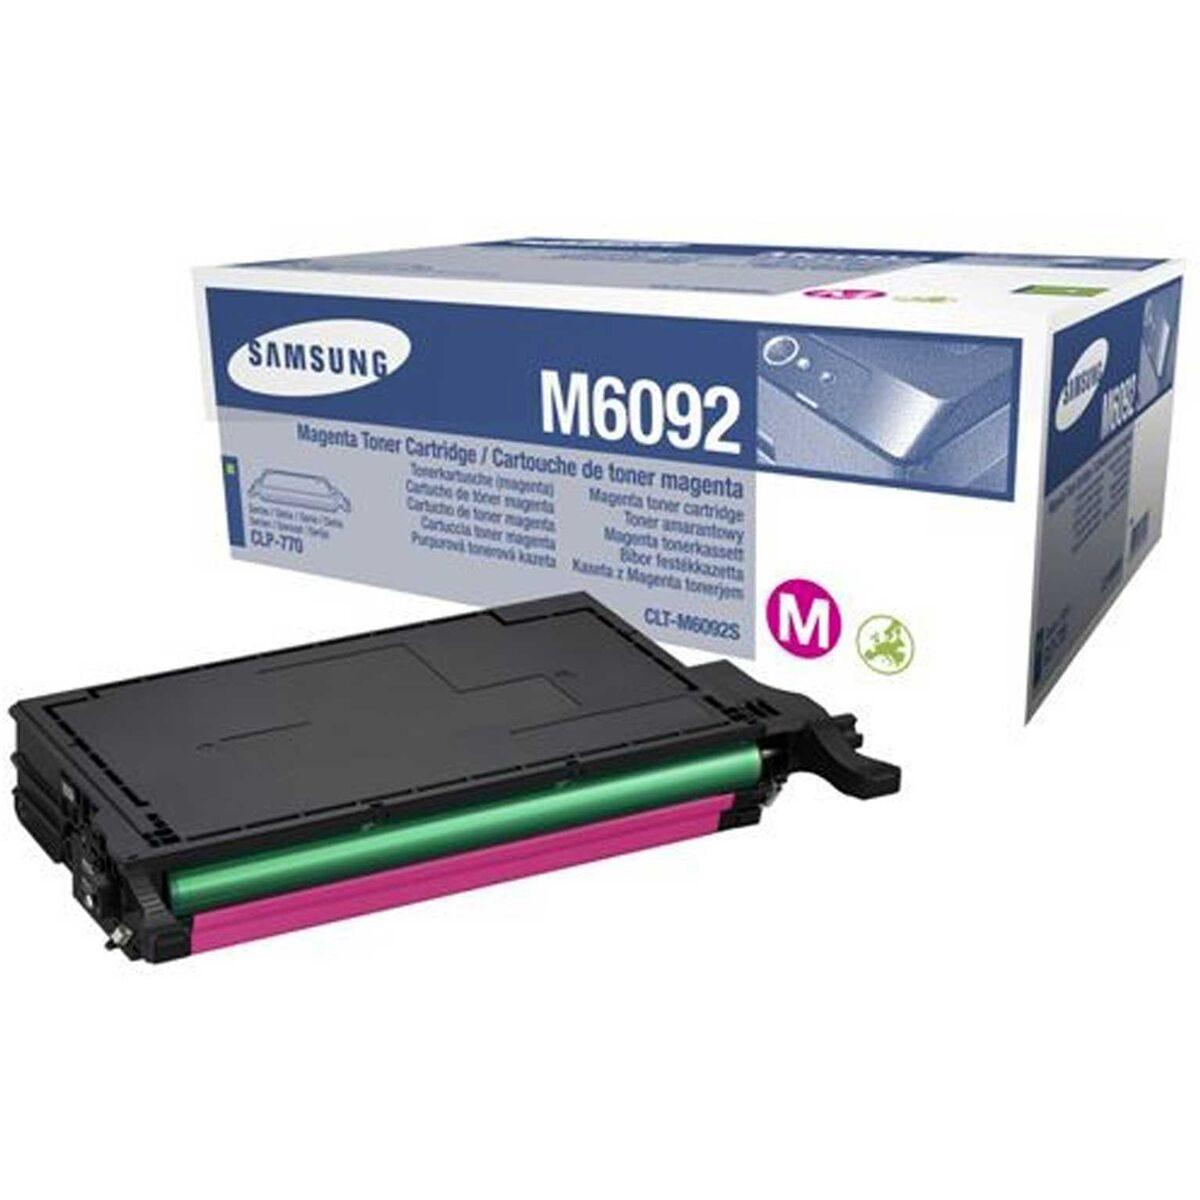 Samsung CLT-M6092S Printer Toner Cartridge